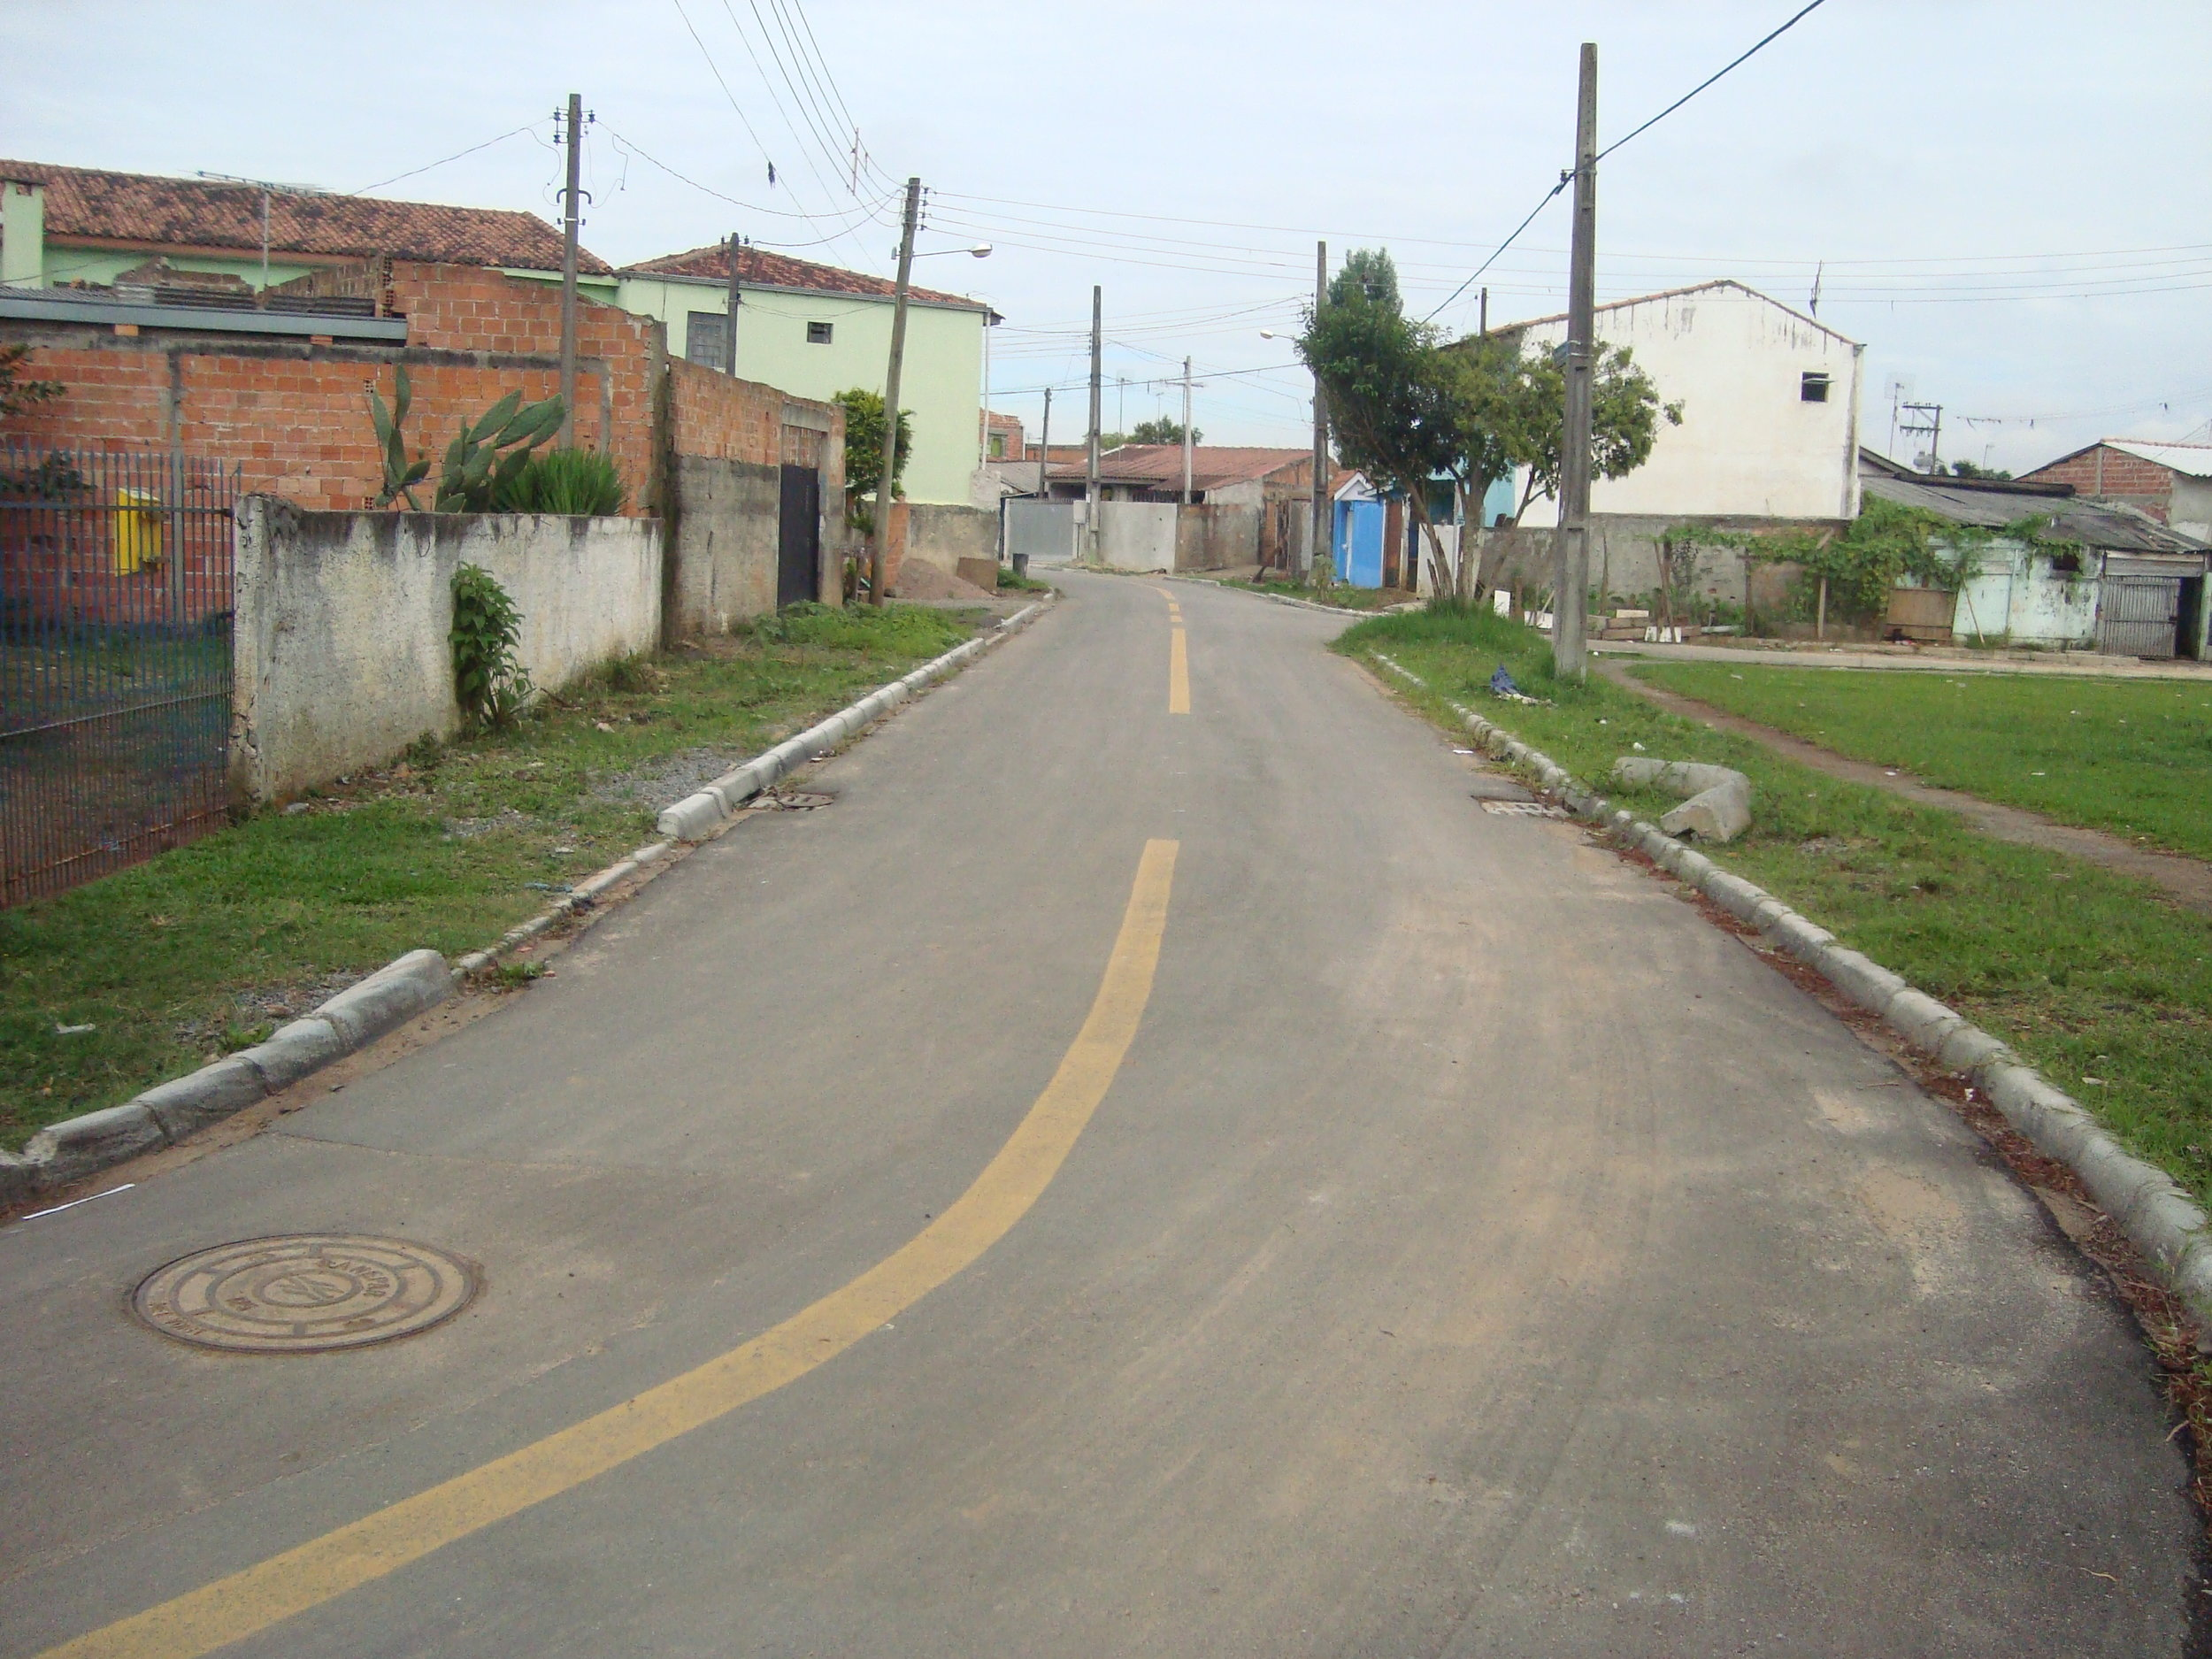 Rua Raynold Morbis, Acrópoles ll - DEPOIS